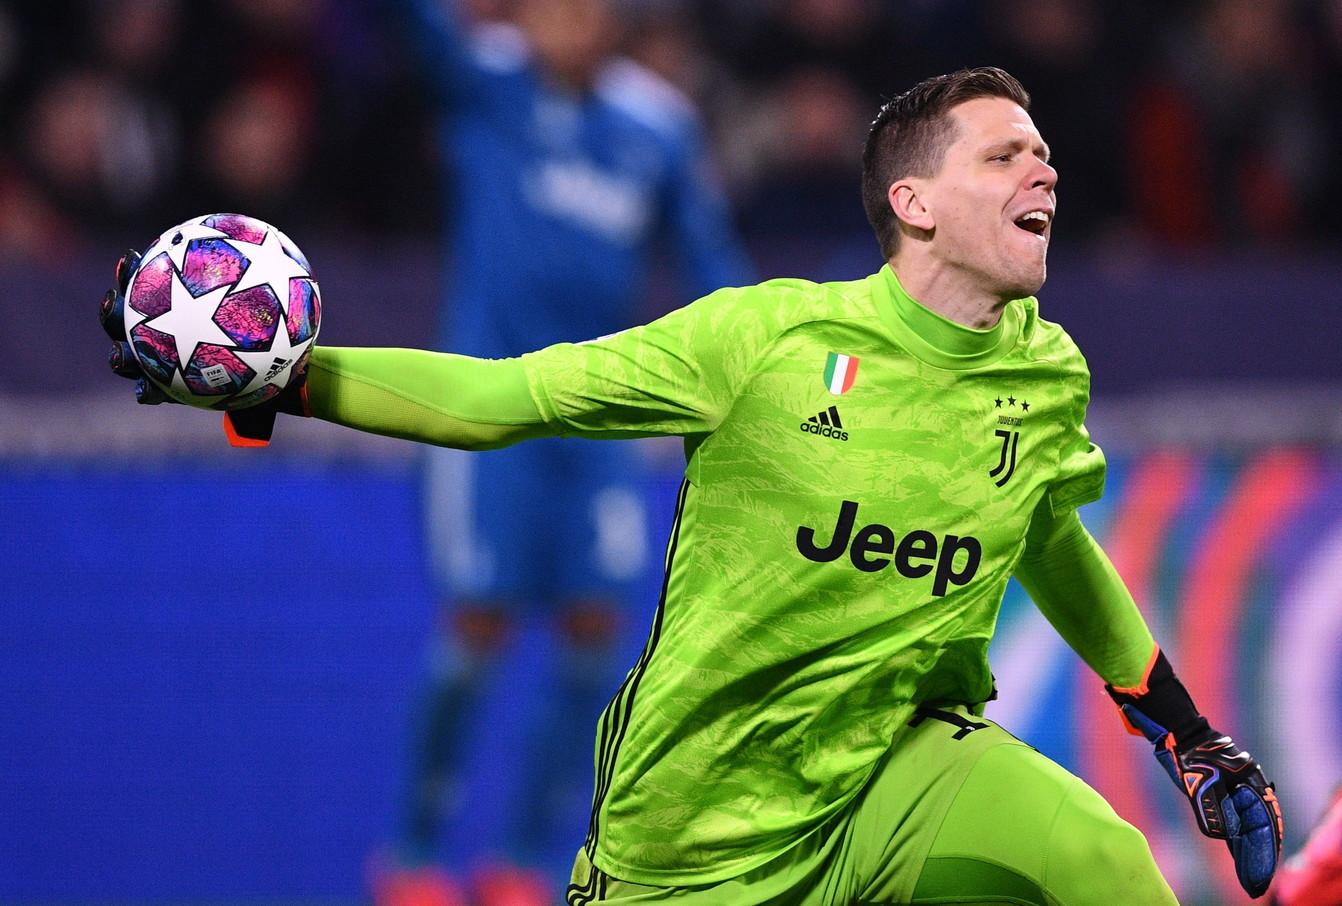 3) Szczesny (Juventus): -30%, da 52,04 milioni a 36,58